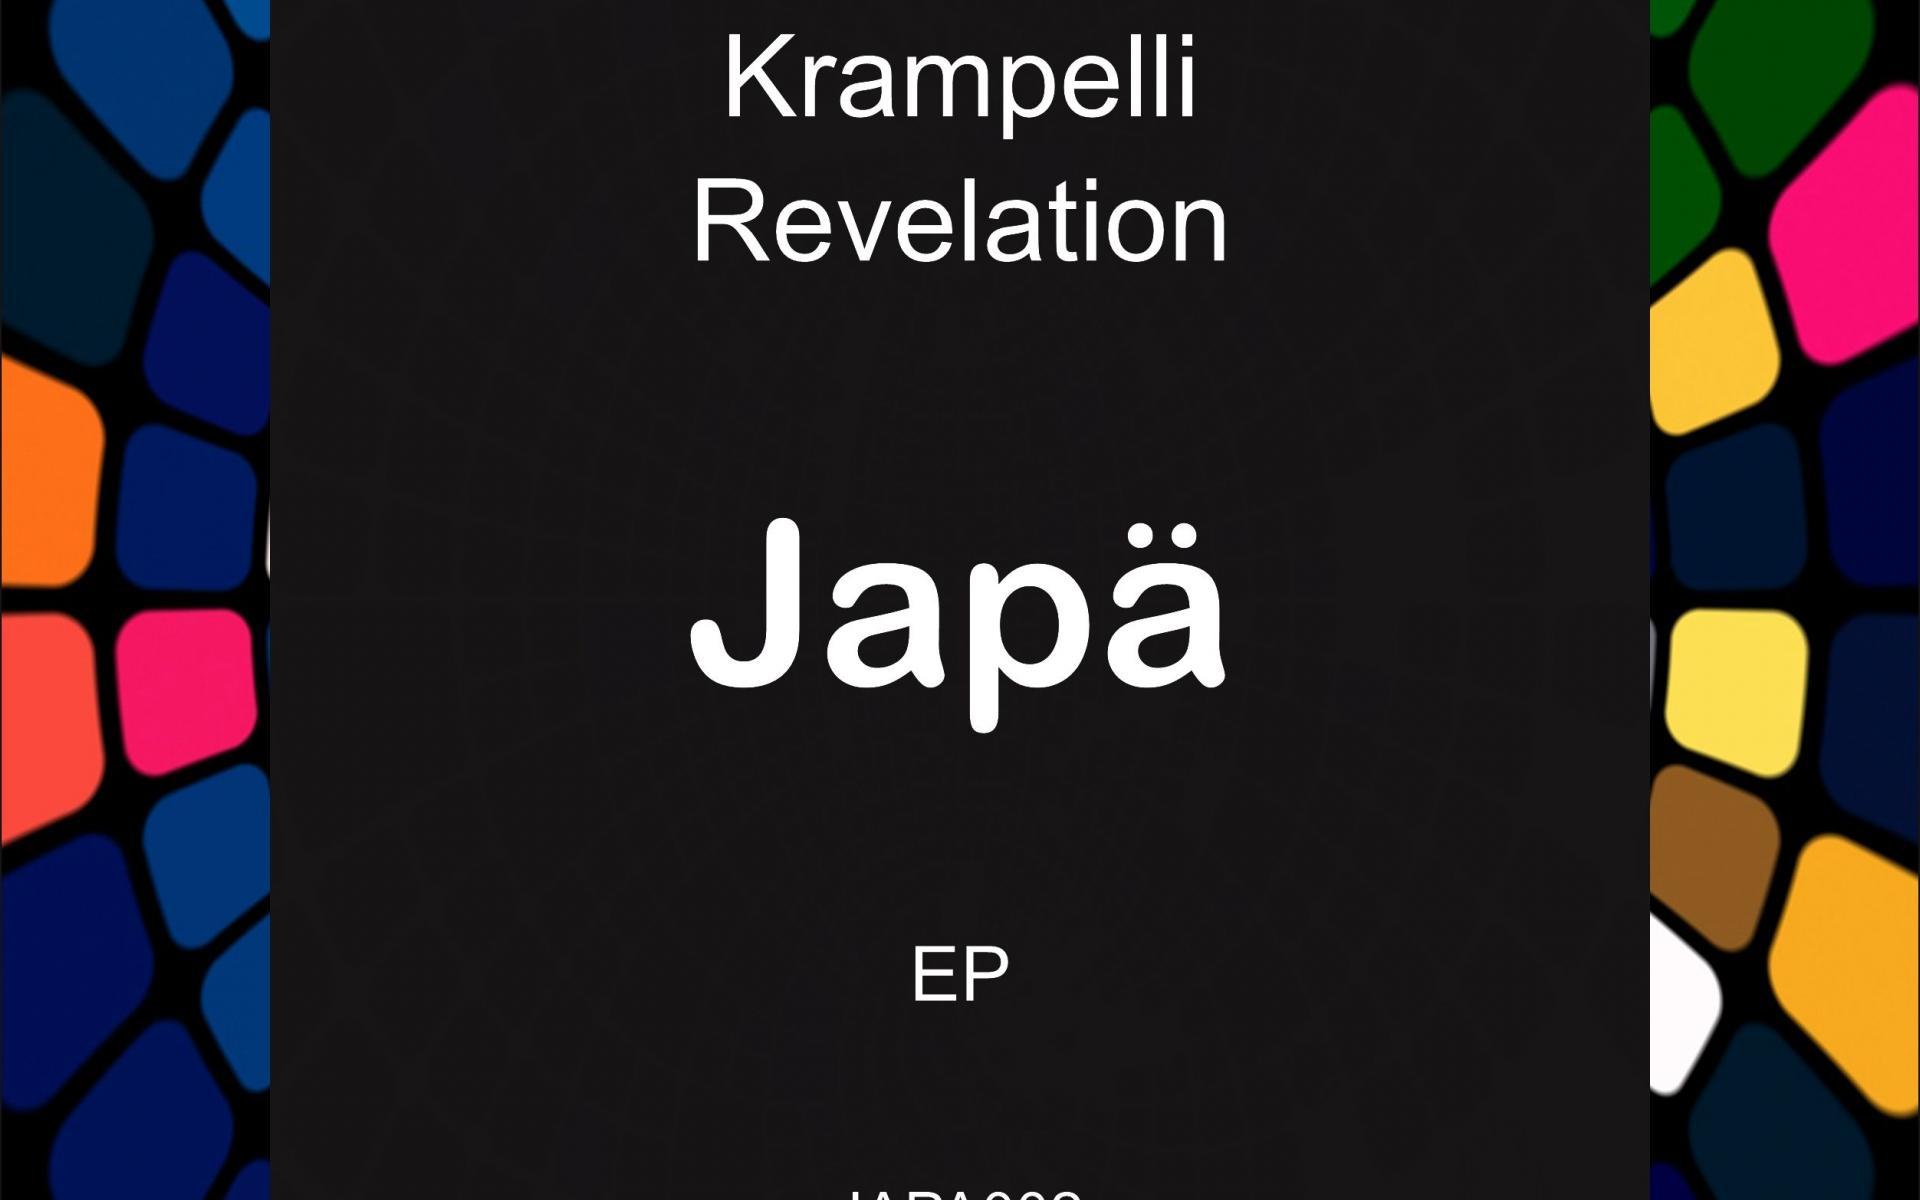 Krampelli - Revelation